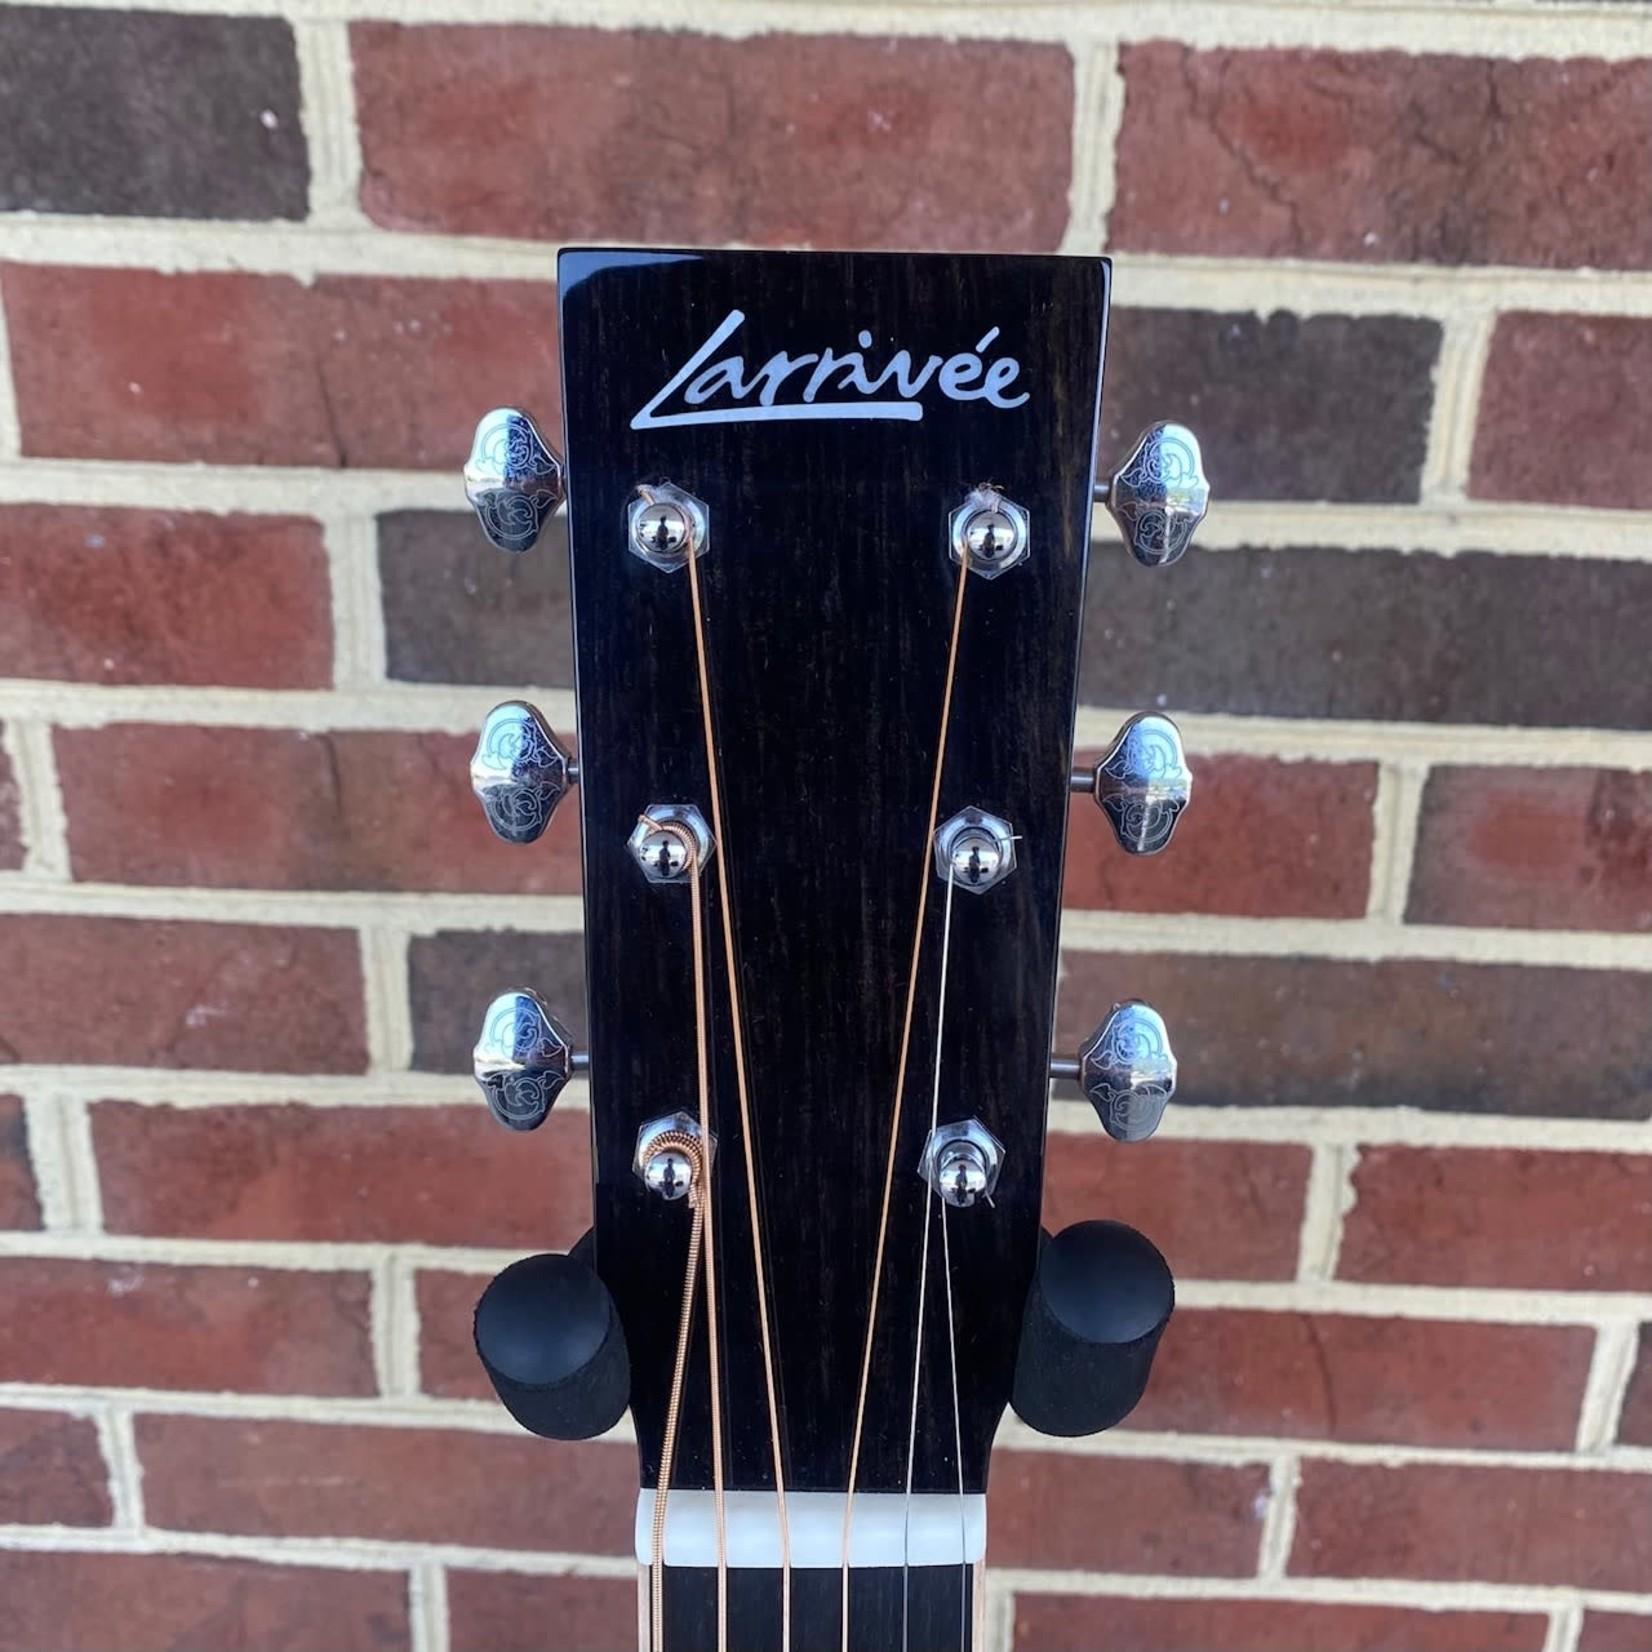 Larrivee Larrivee OM-44RE, Indian Rosewood Back and Sides, Moon Spruce Top, LR Baggs Anthem No Cut Electronics, Hardshell Case